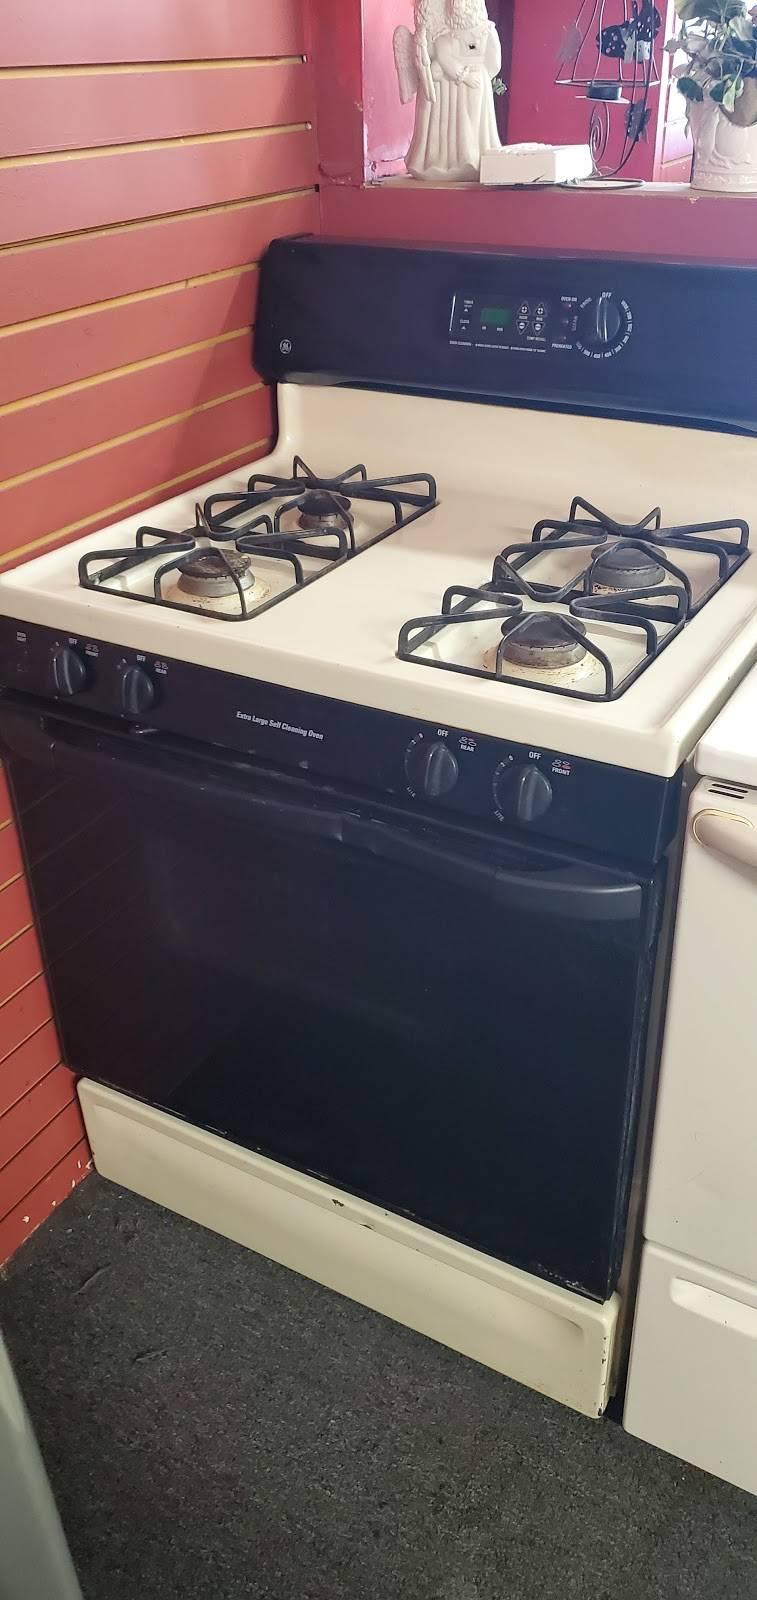 Nu 2U Appliances - home goods store    Photo 1 of 4   Address: 5017 W Capitol Dr, Milwaukee, WI 53216, USA   Phone: (414) 445-6848